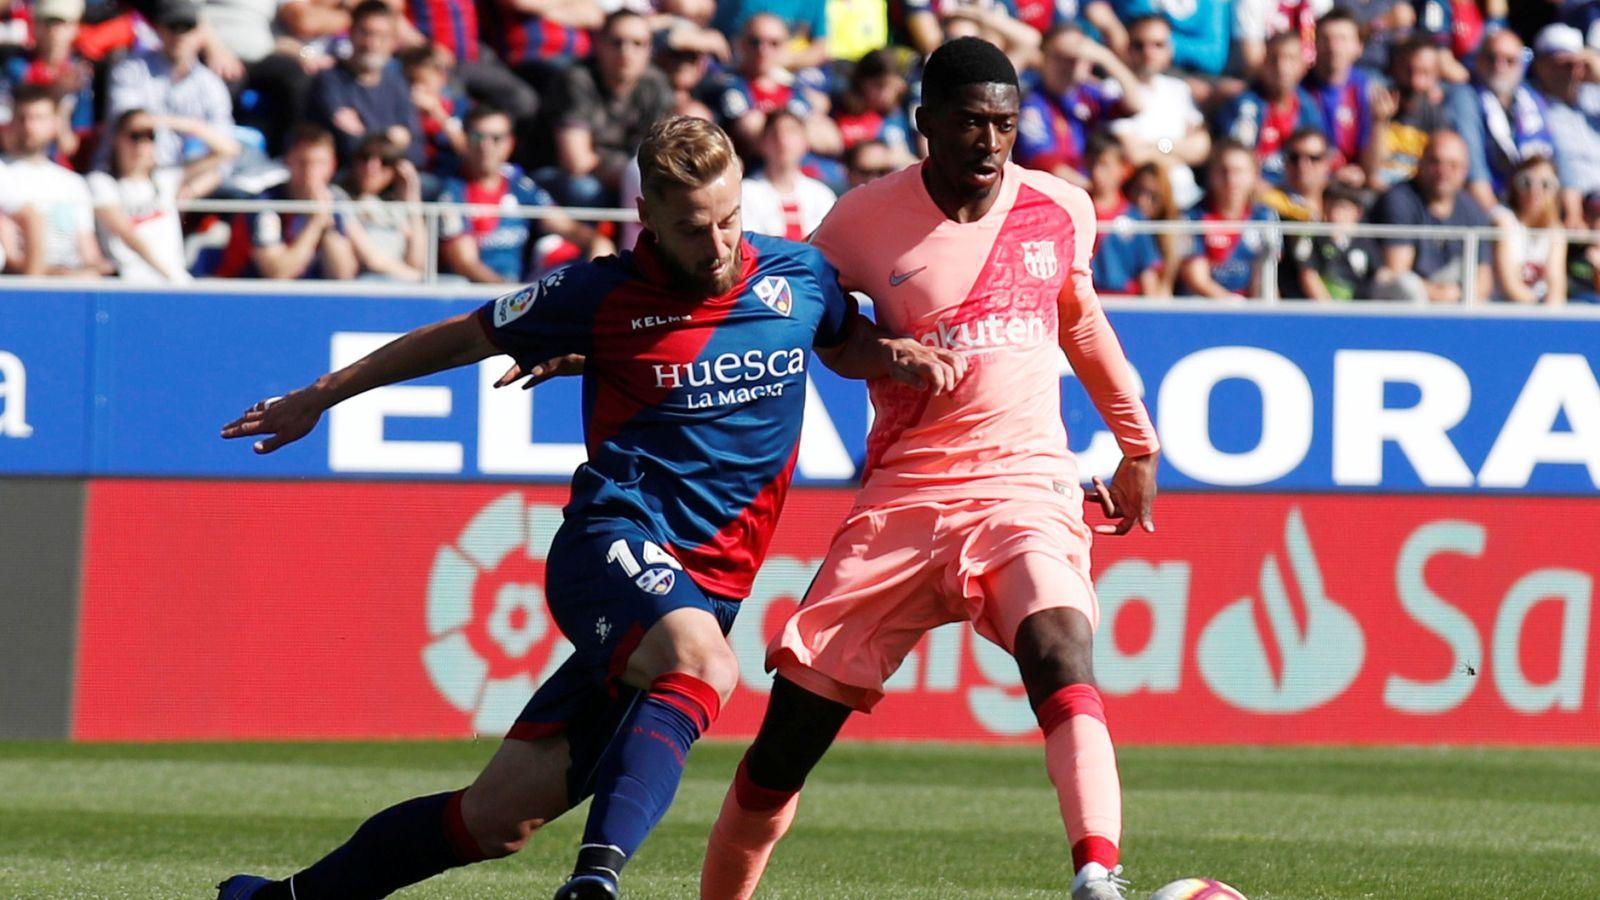 Foto: La liga santander - sd huesca v fc barcelona